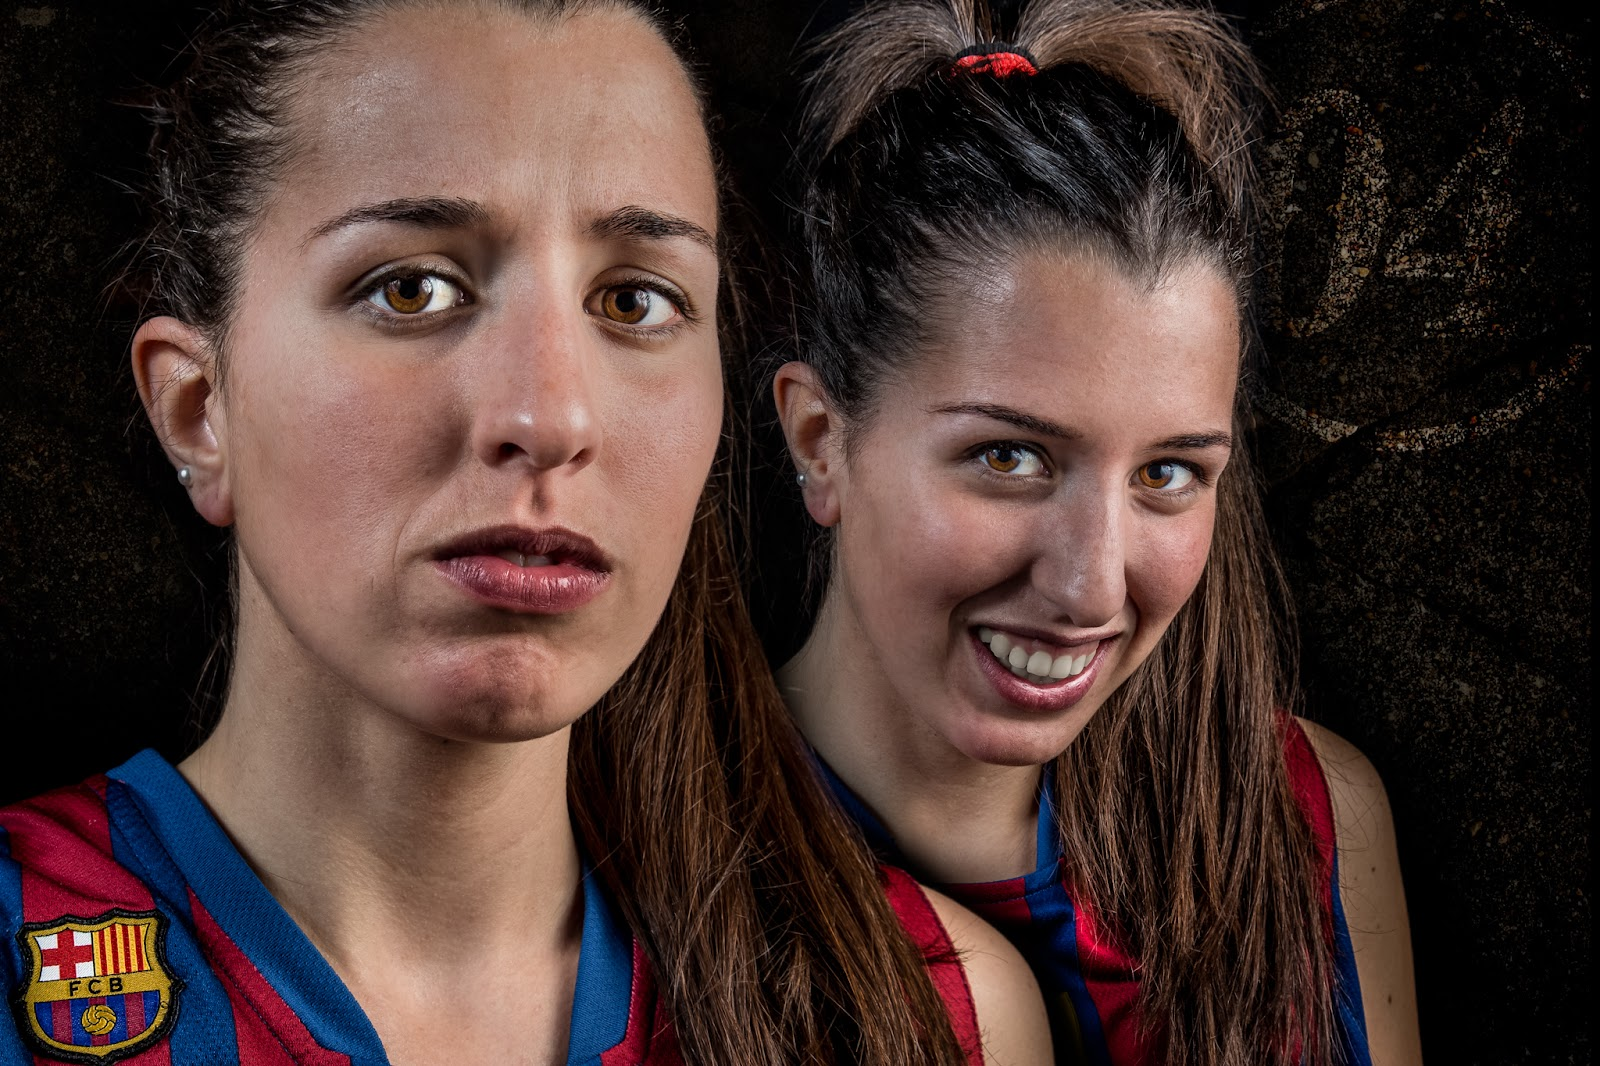 Berta 04 - CBS Barça Senior Femenino A - 2013 :: 2 x Canon EOS 5D MkIII | ISO100 | Canon 24-105 @47&58mm | f/11 | 1/60s